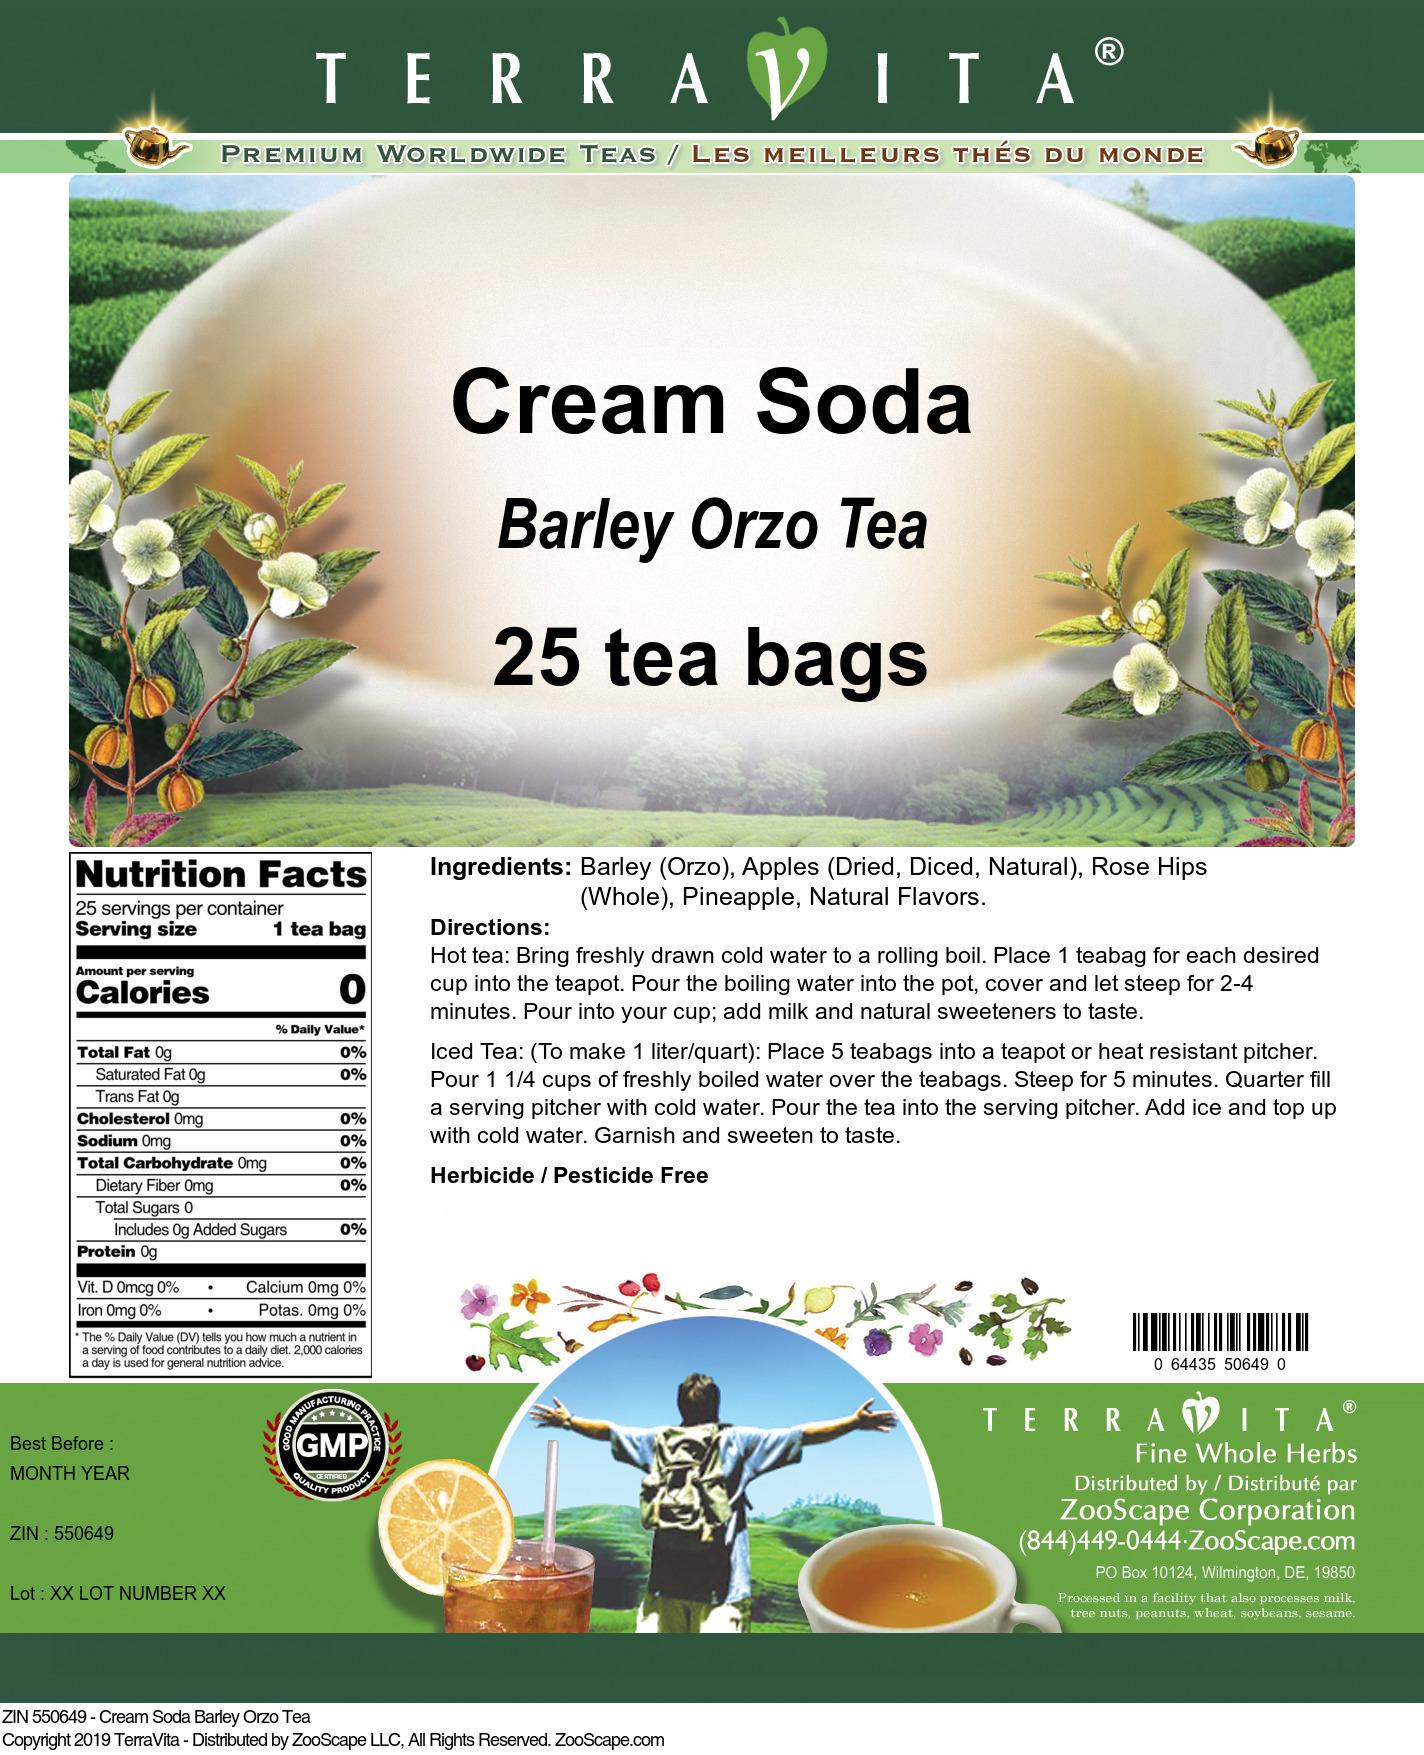 Cream Soda Barley Orzo Tea